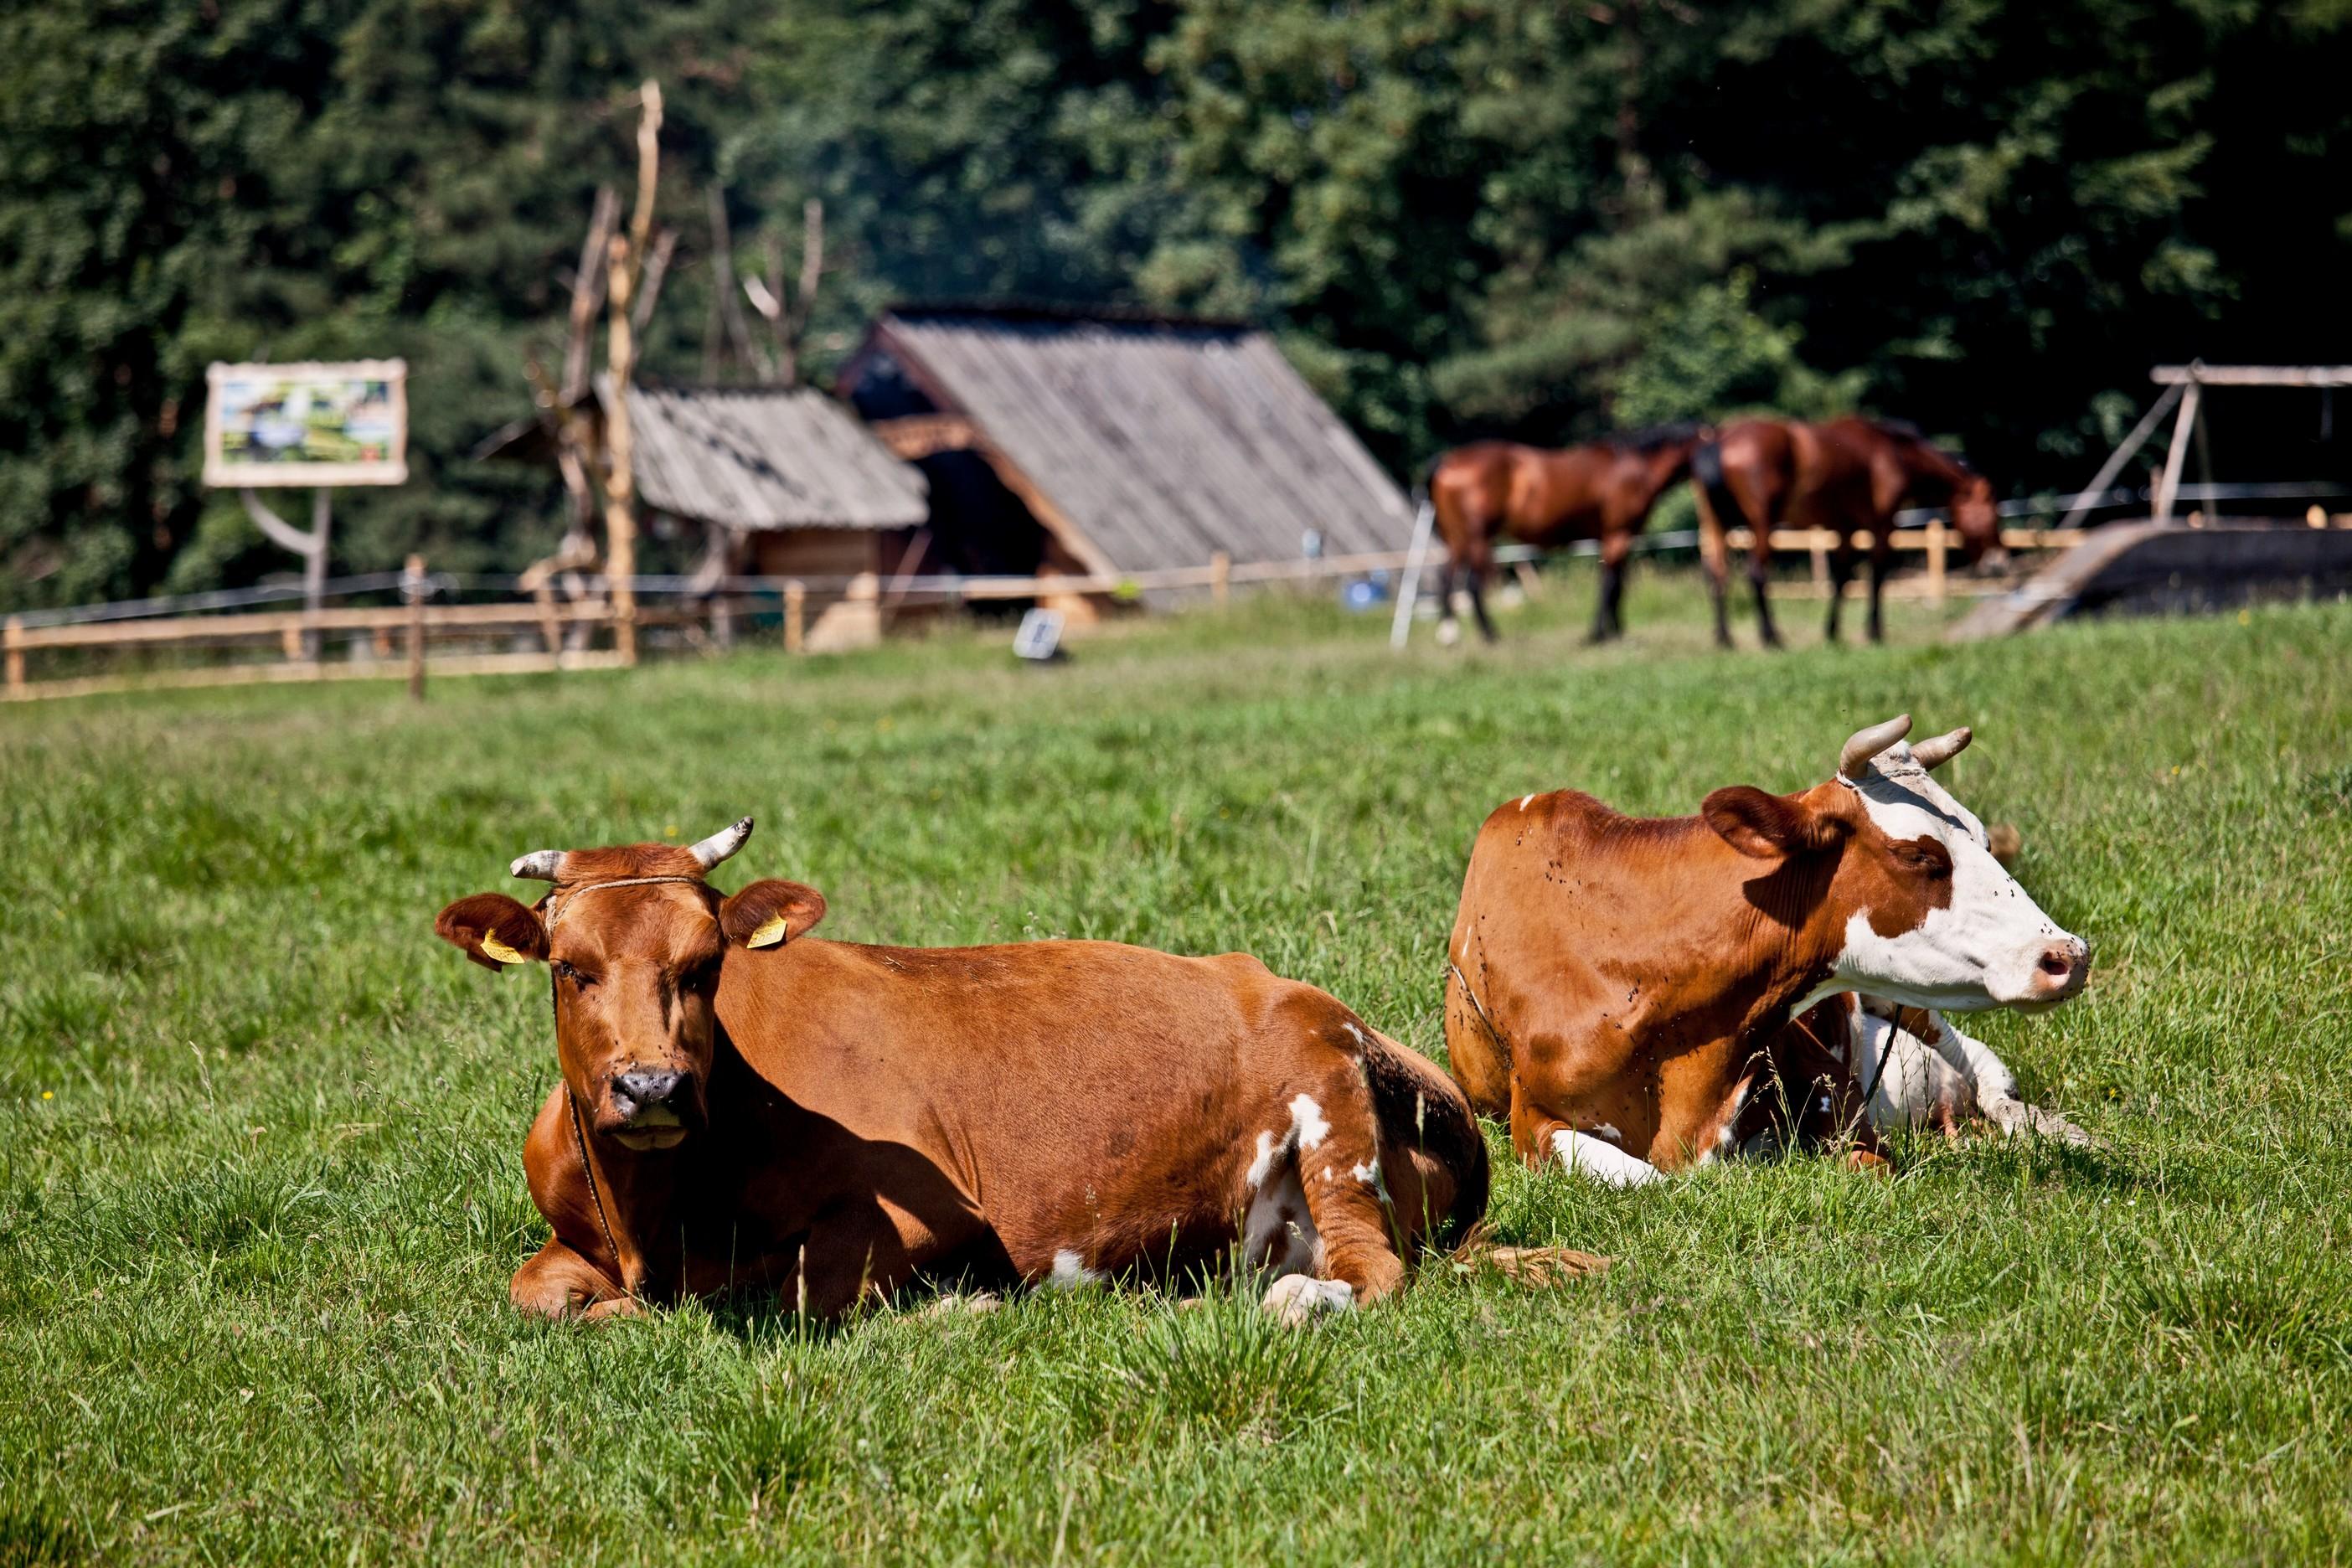 bovine services Laurens, South Carolina